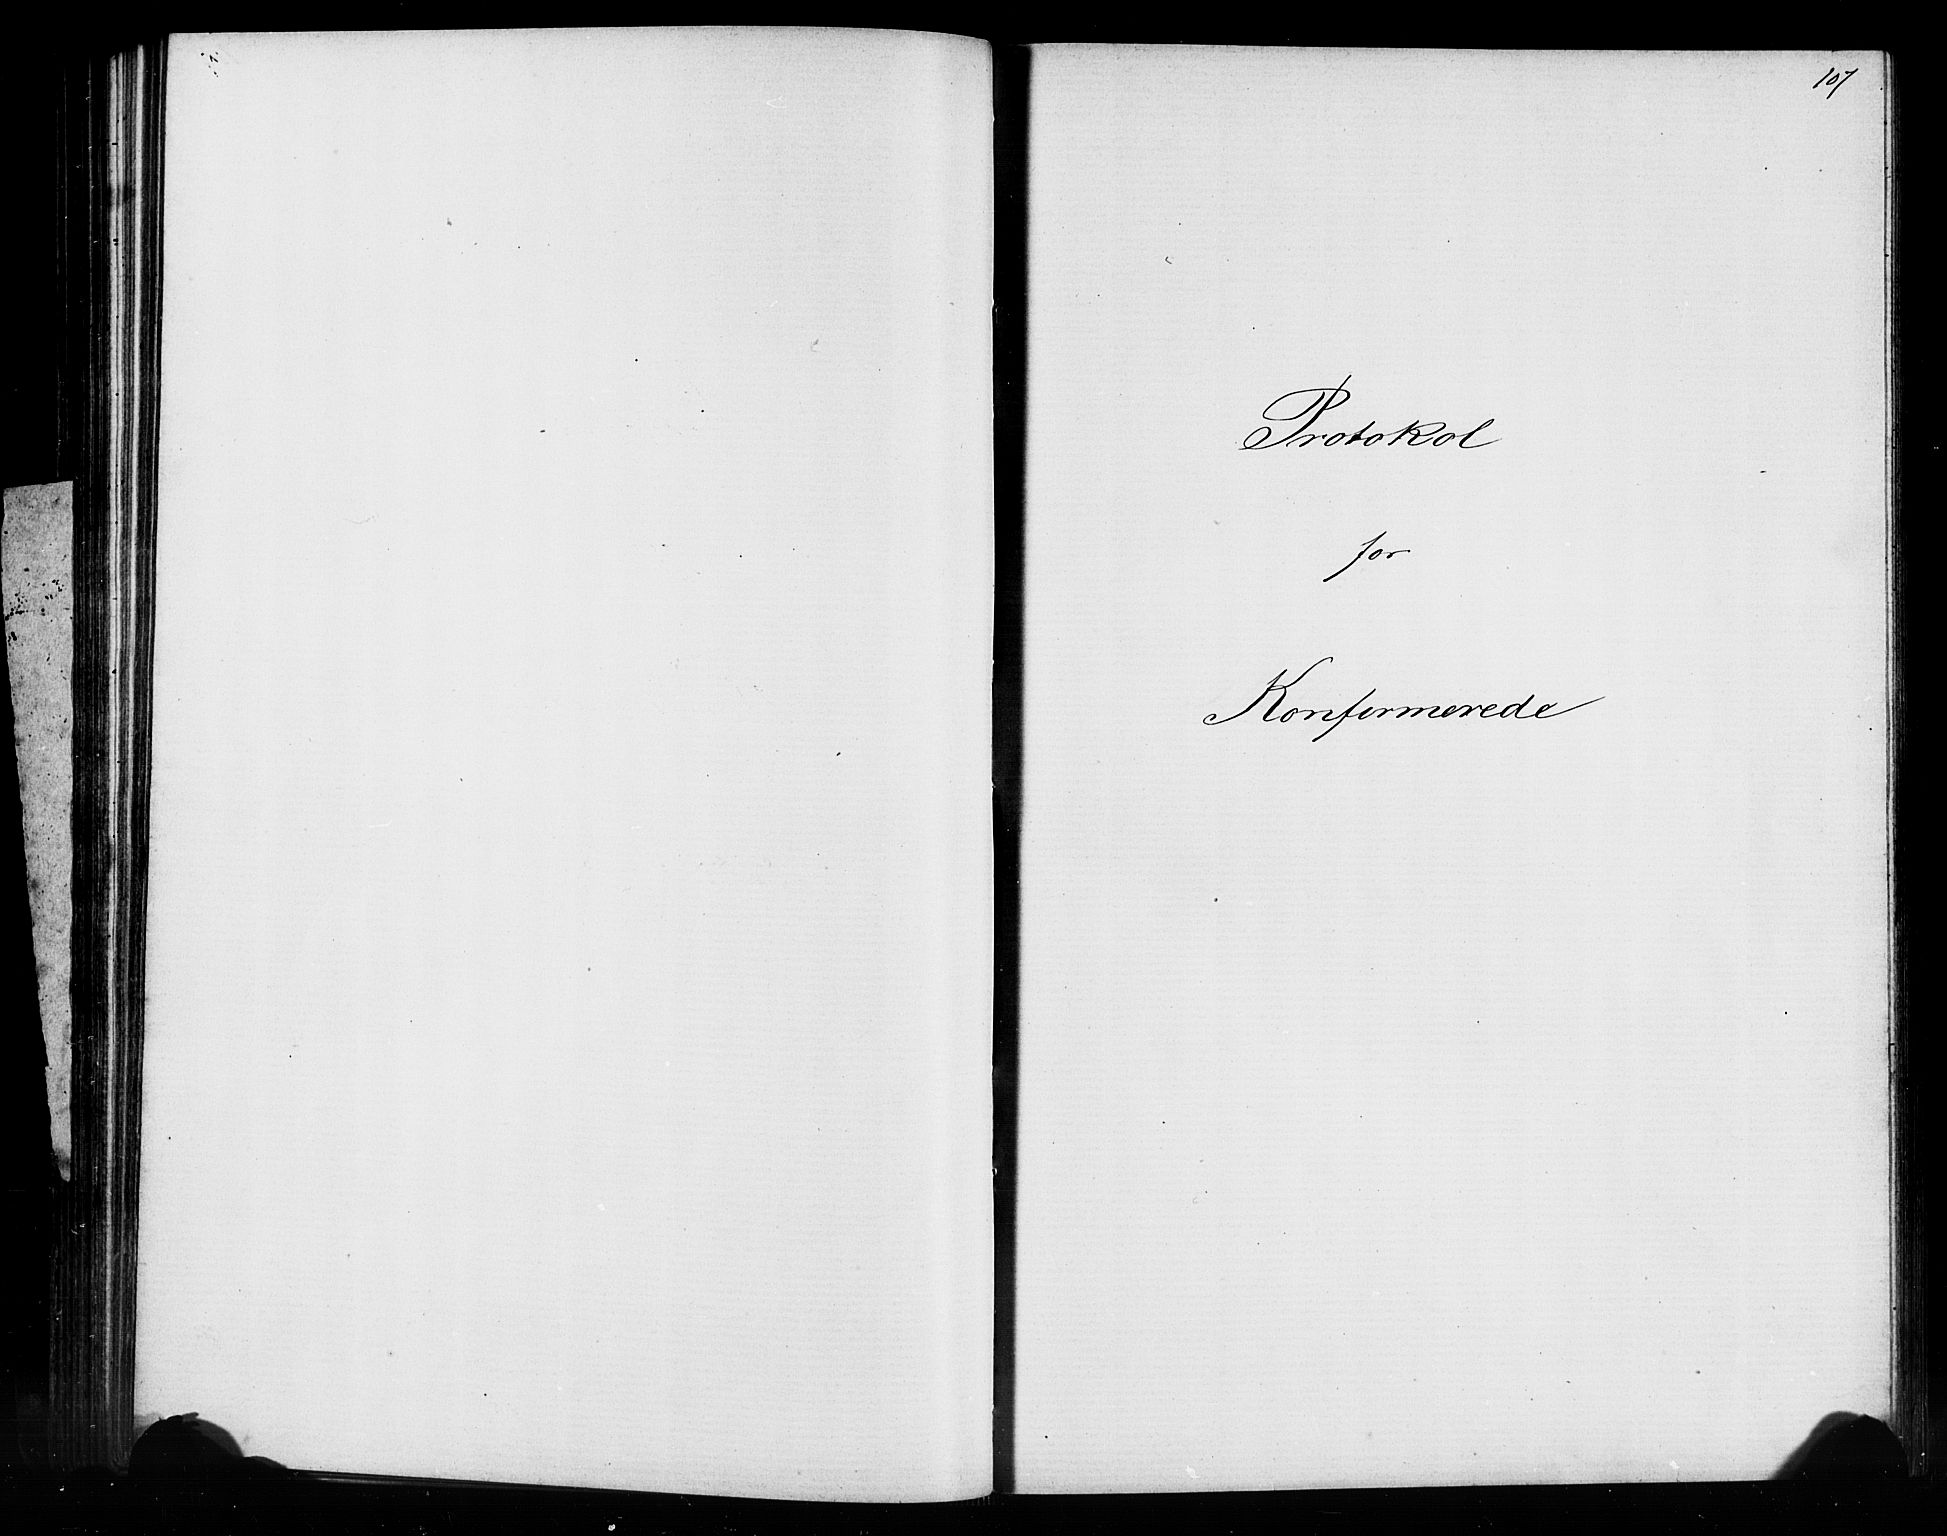 SAB, Leikanger Sokneprestembete, Klokkerbok nr. A 1, 1873-1916, s. 107